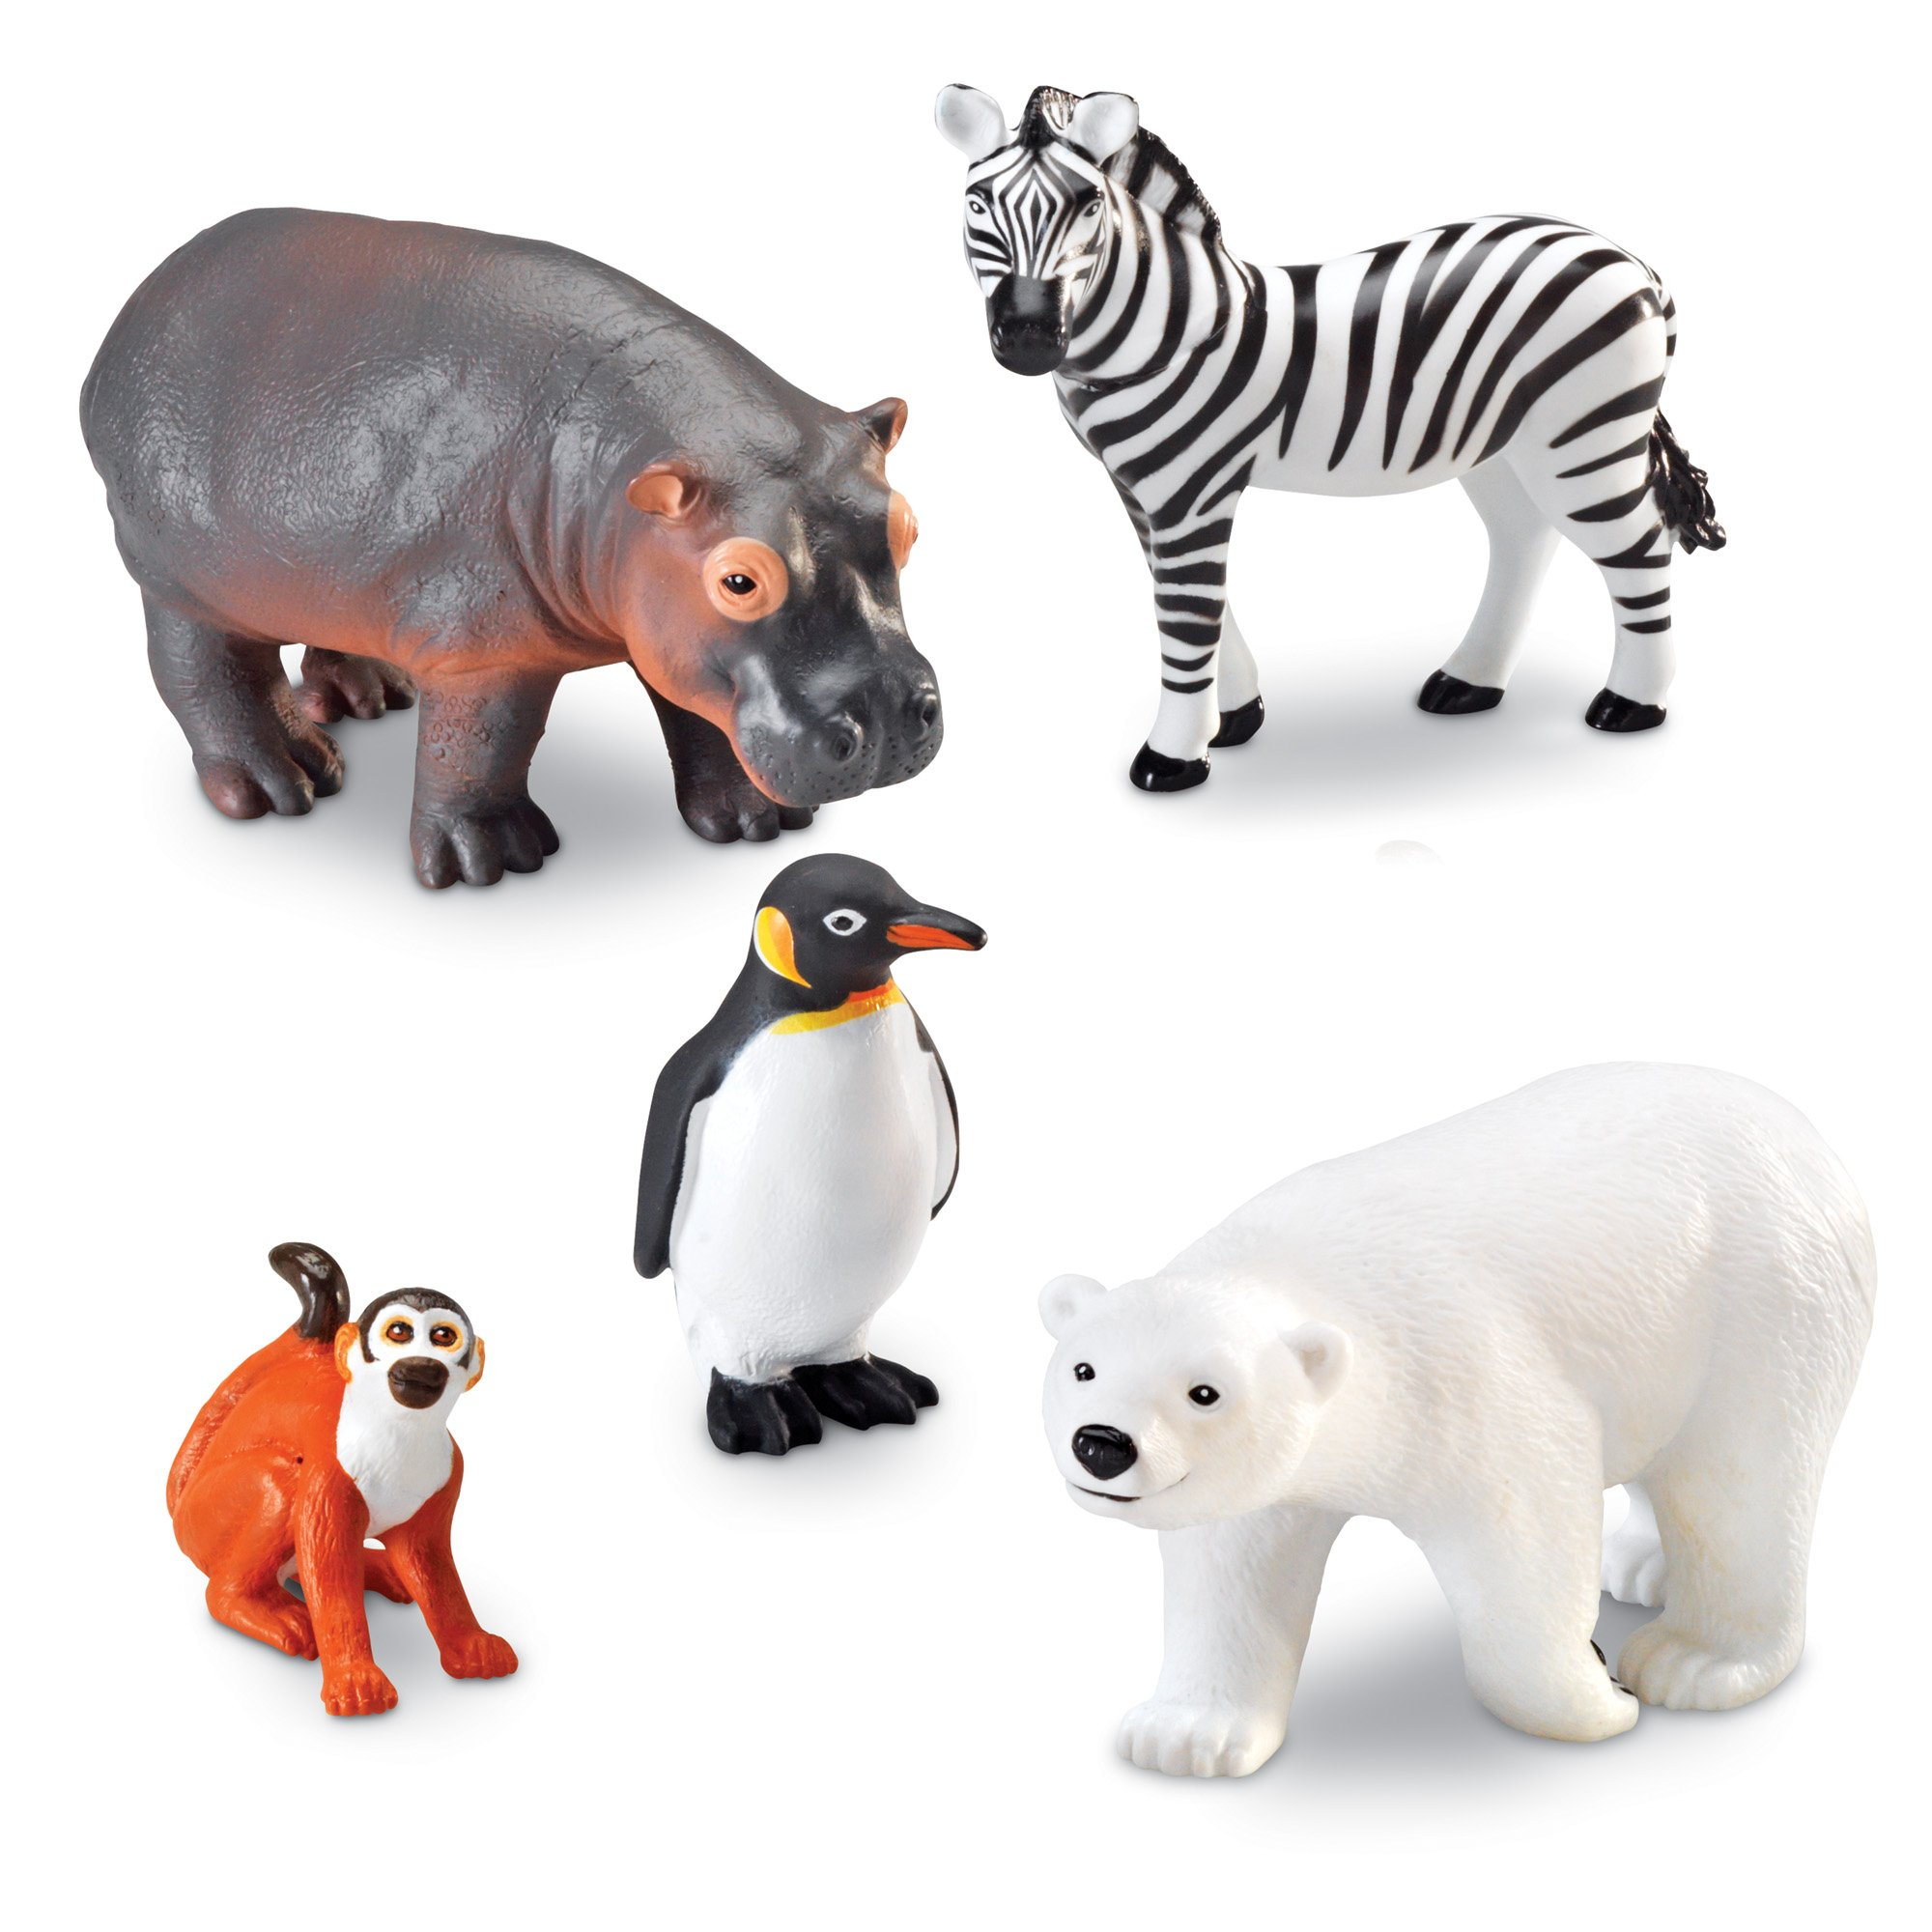 Learning Resources Jumbo Zoo Animals, Monkey, Penguin, Zebra, Polar Bear, and Hippo, 5 Animals, Ages 2+